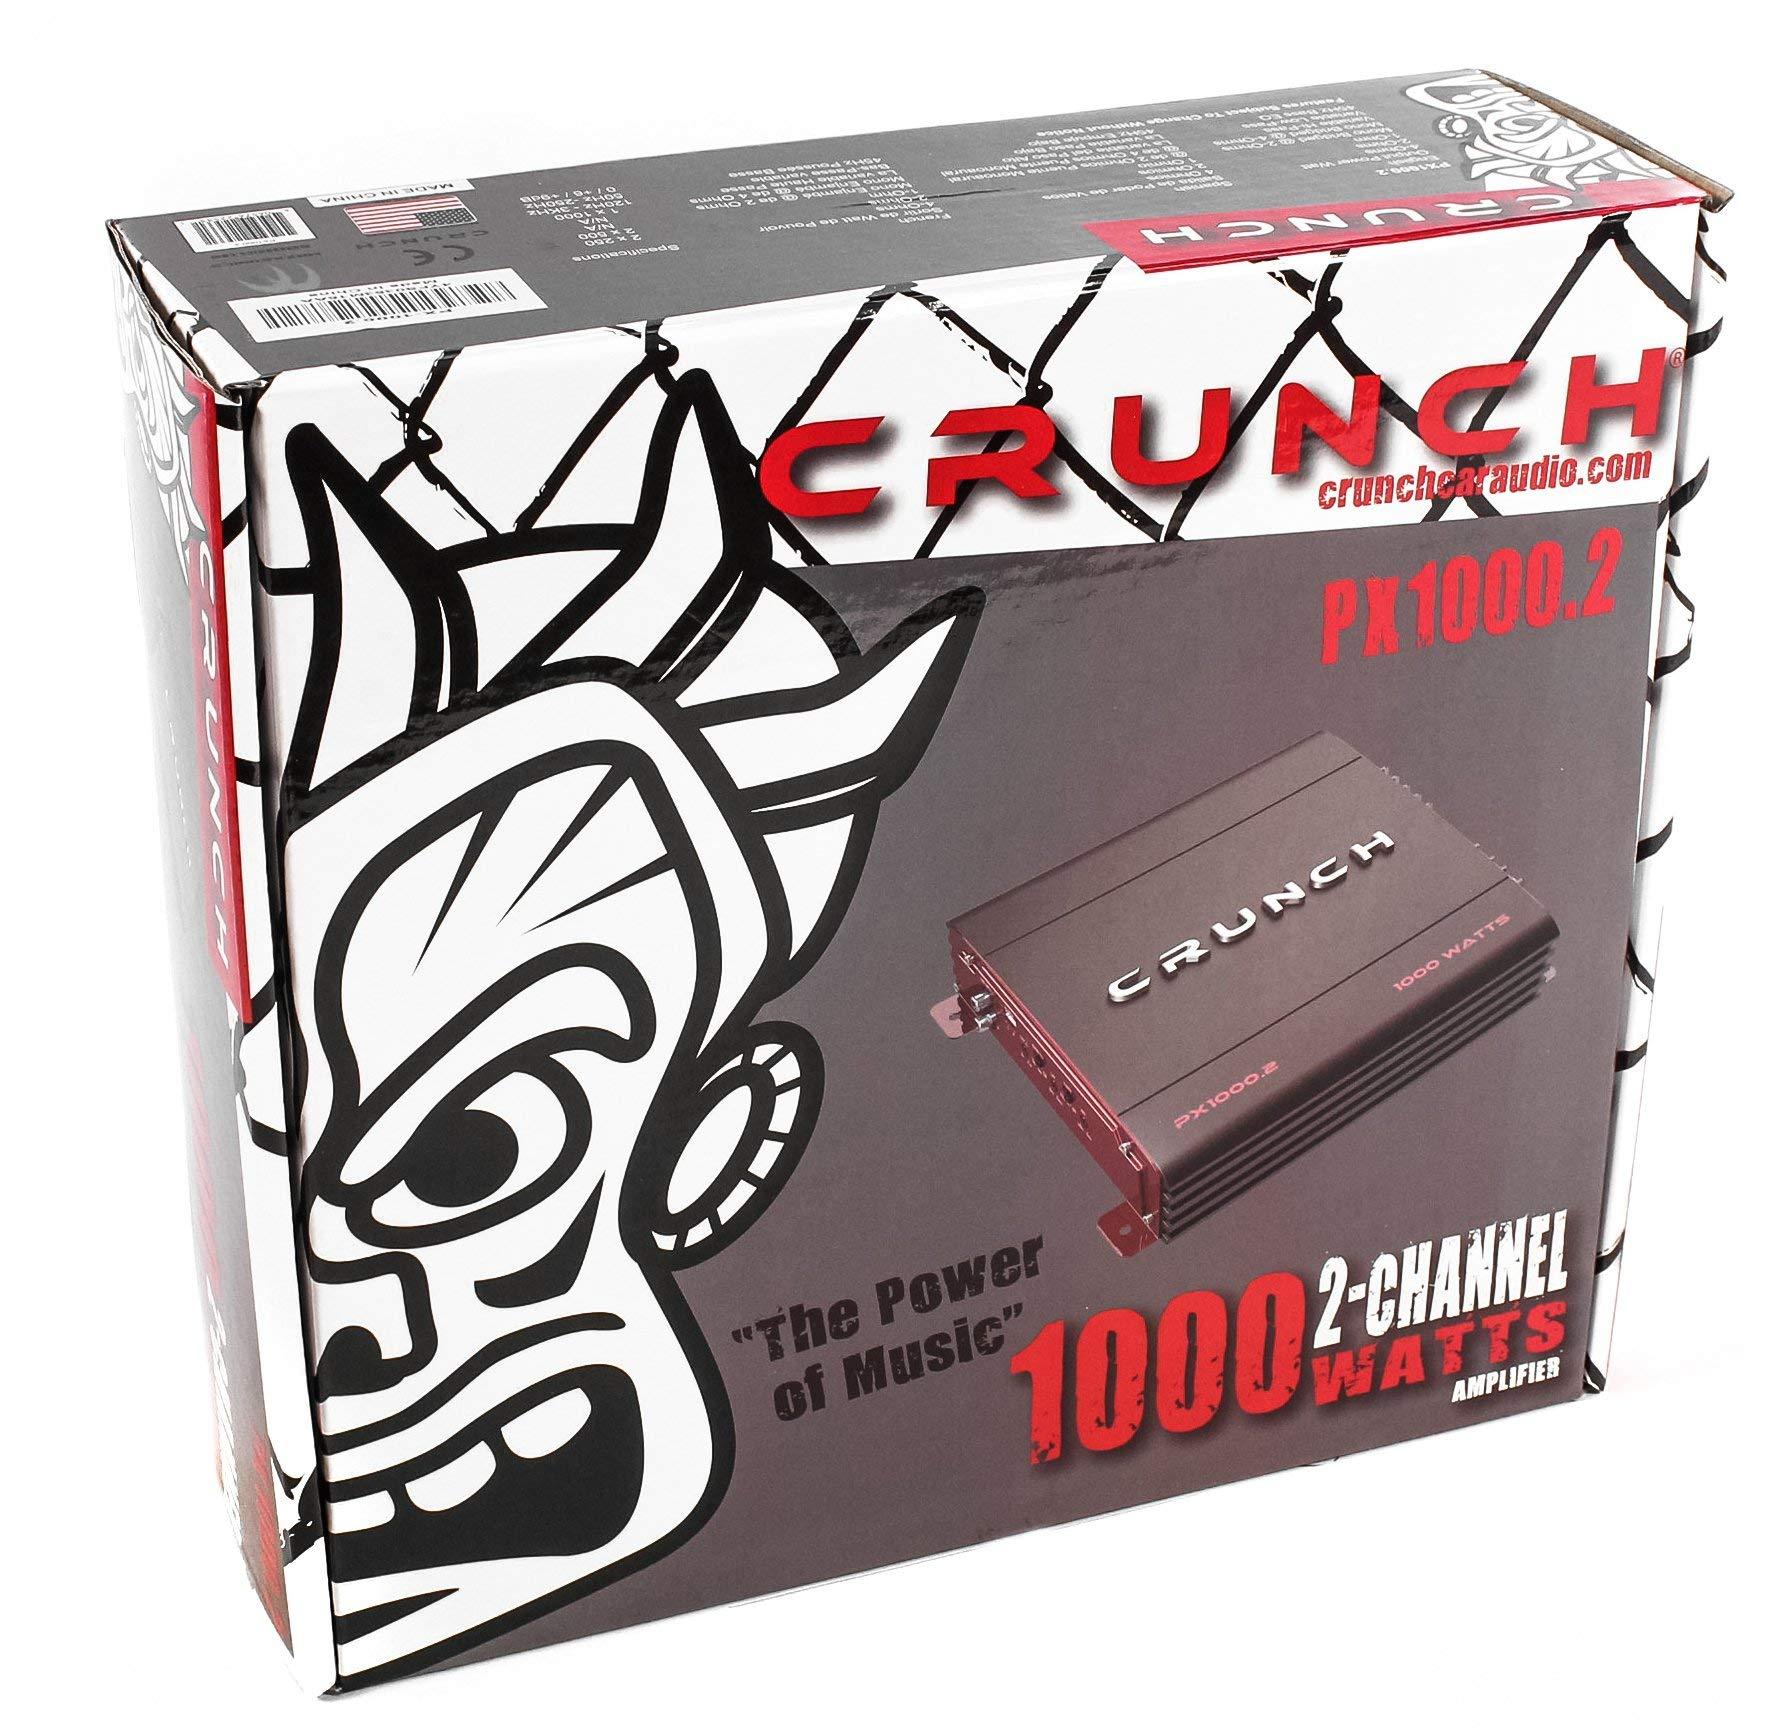 Crunch Px 10002 2 Channel 1000 Watt Amp A B Car Stereo Amplifier Audio Installation Wiring Kits Kit Aks8 Dual Amplifiers Electronics Tibs